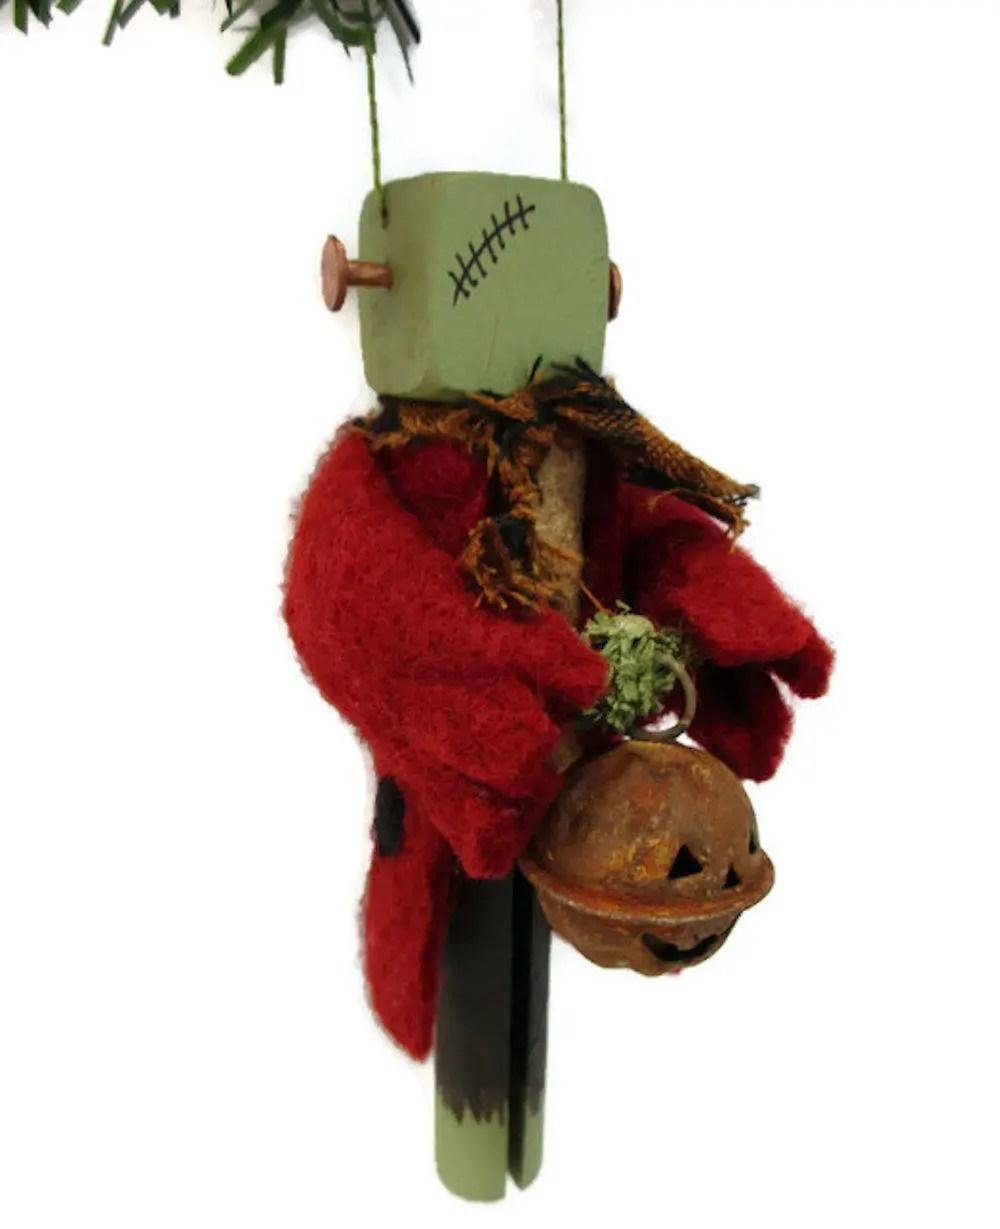 Frankenstein Monster Ornament Clothespin Ornament Halloween